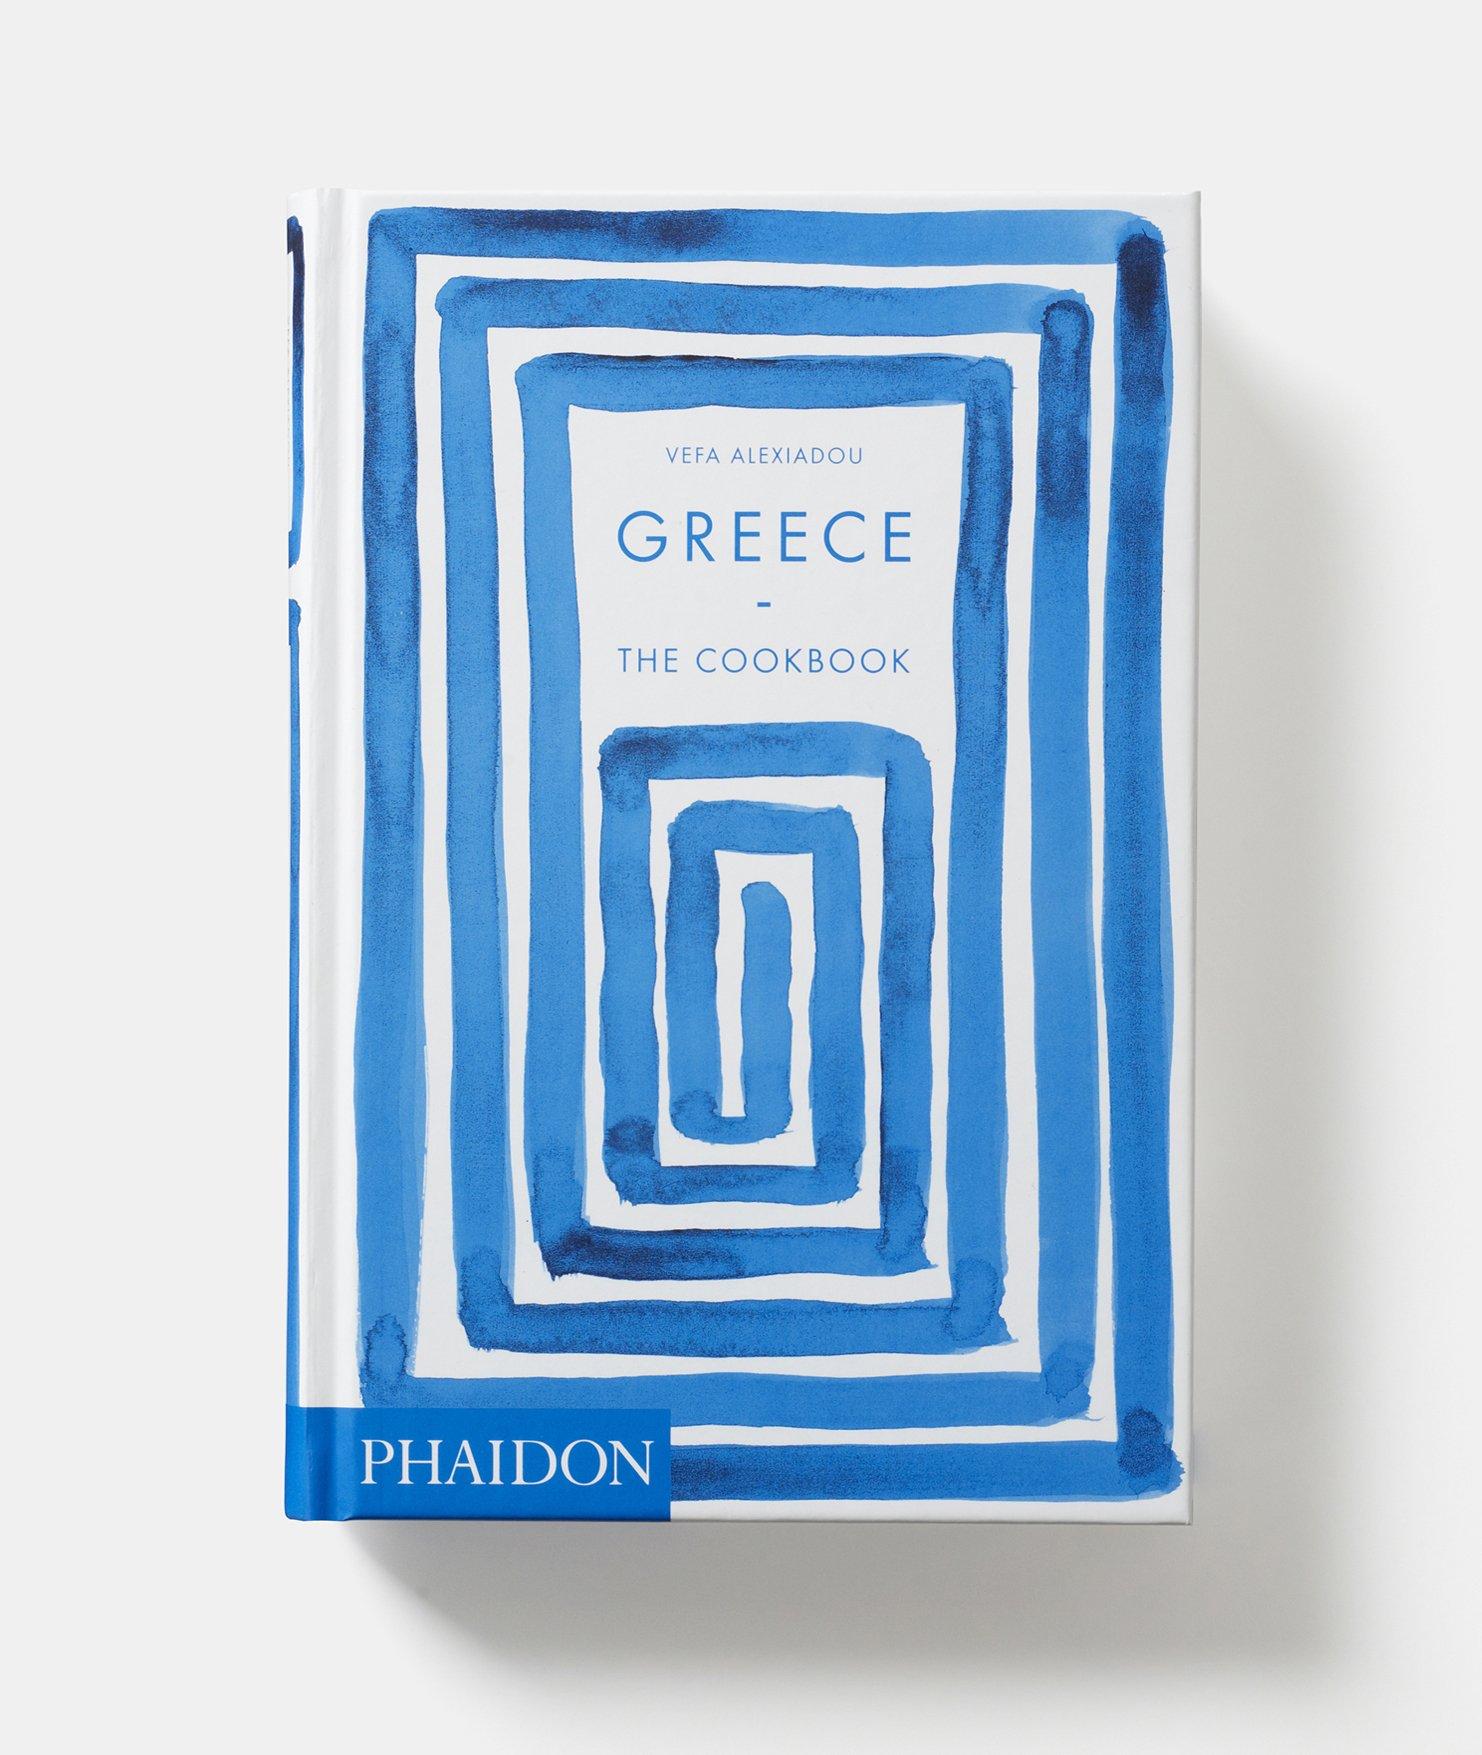 Greece. The cookbook. Tapa dura.